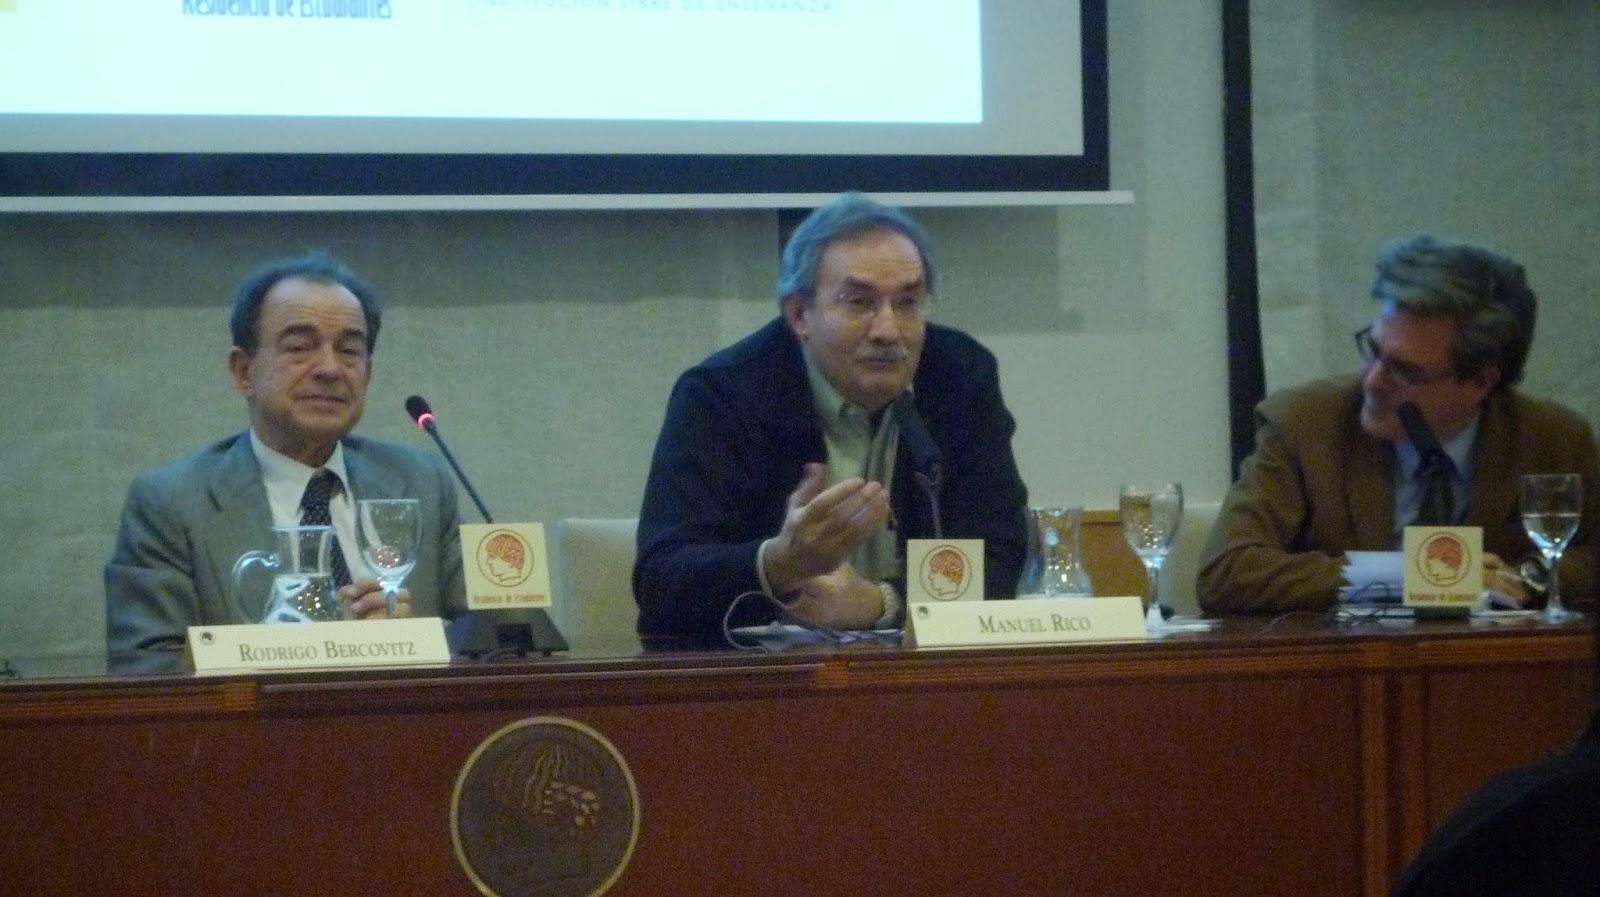 Rodrigo Bercovitz, Manuel Rico y Javier Celaya